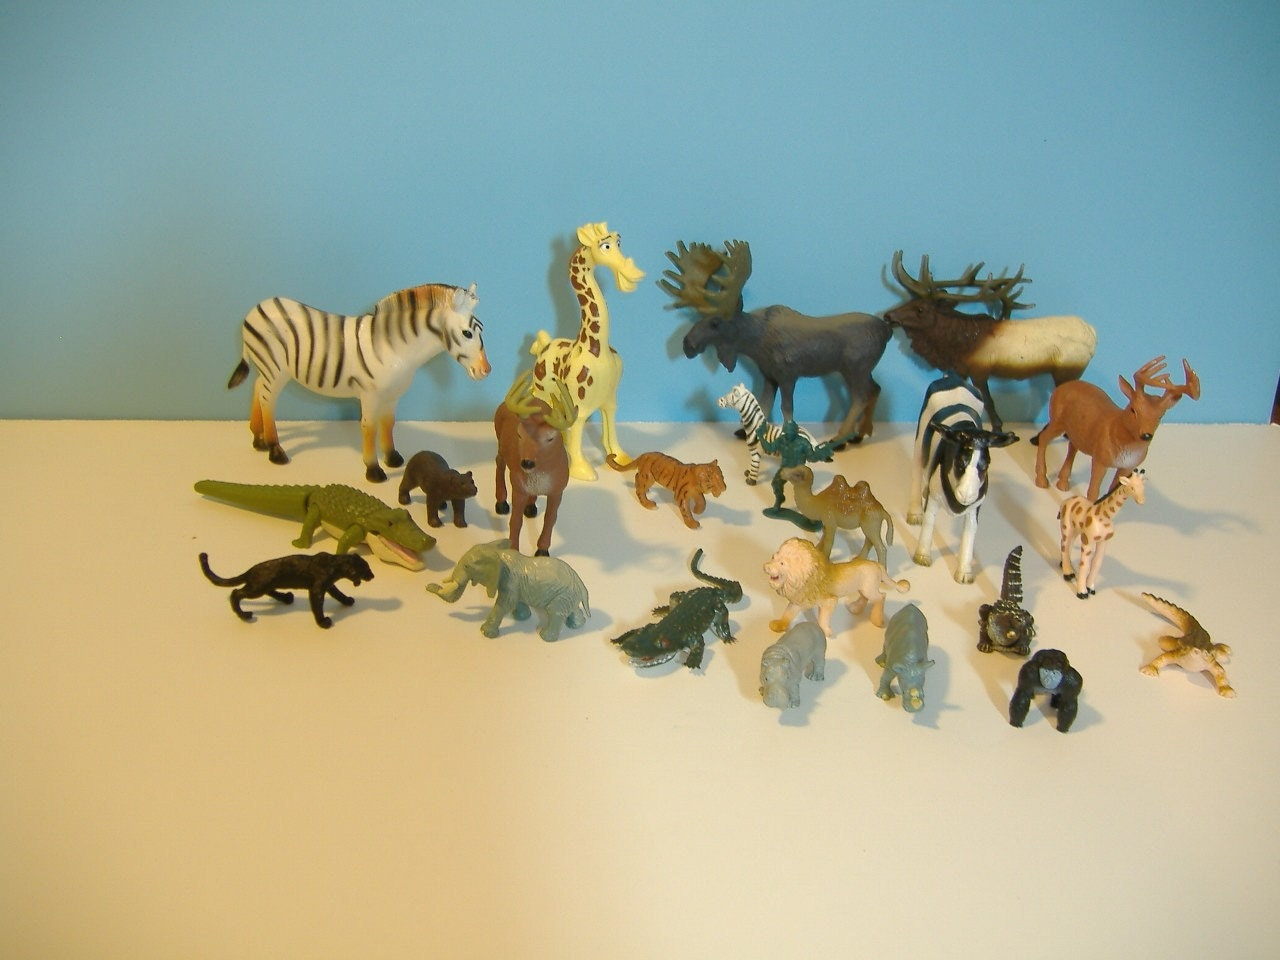 Zoo animals toys - photo#5